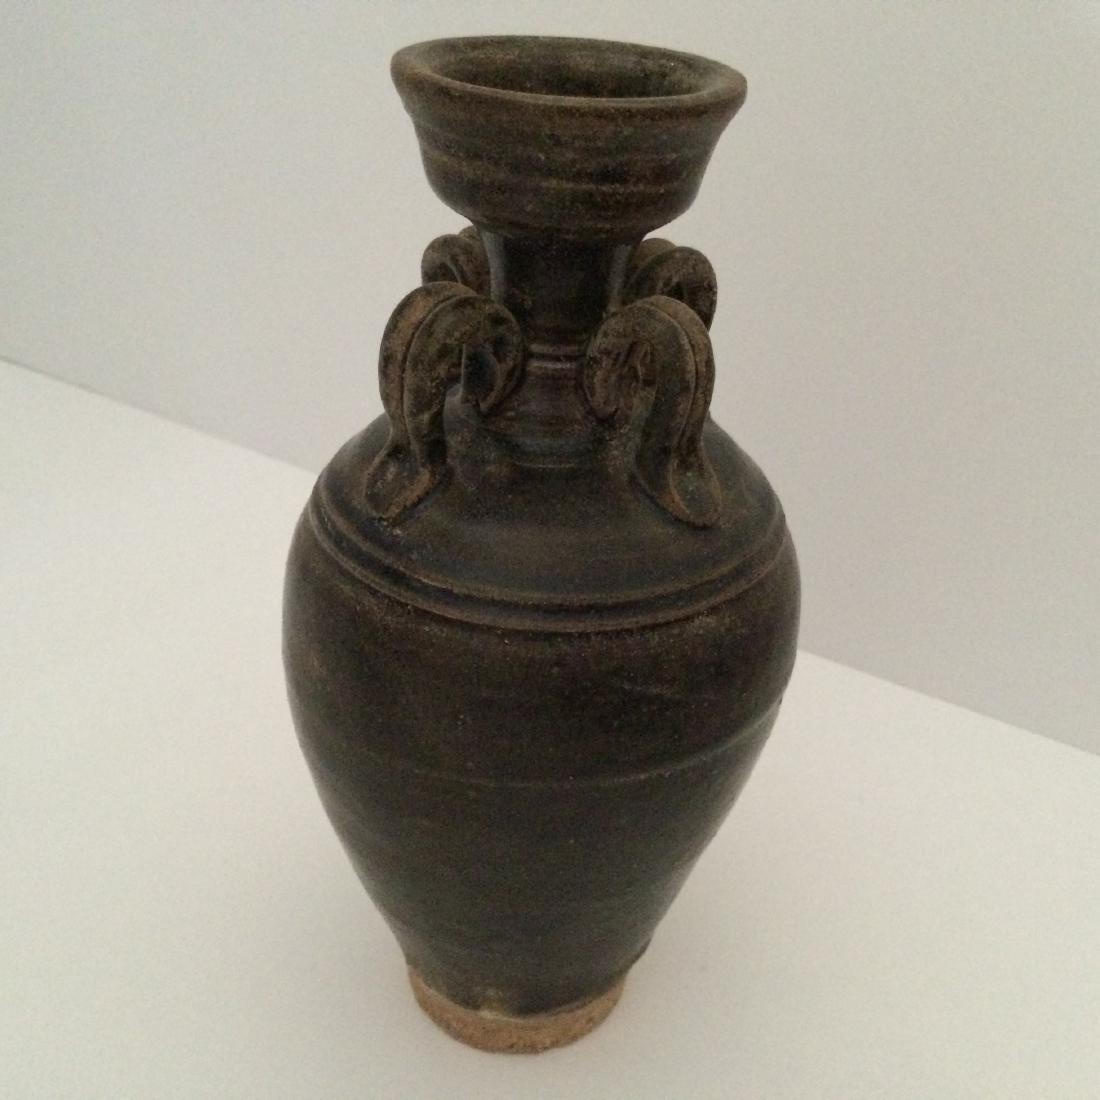 Yuan Dynasty Porcelain Vase 4 Ears, Brown